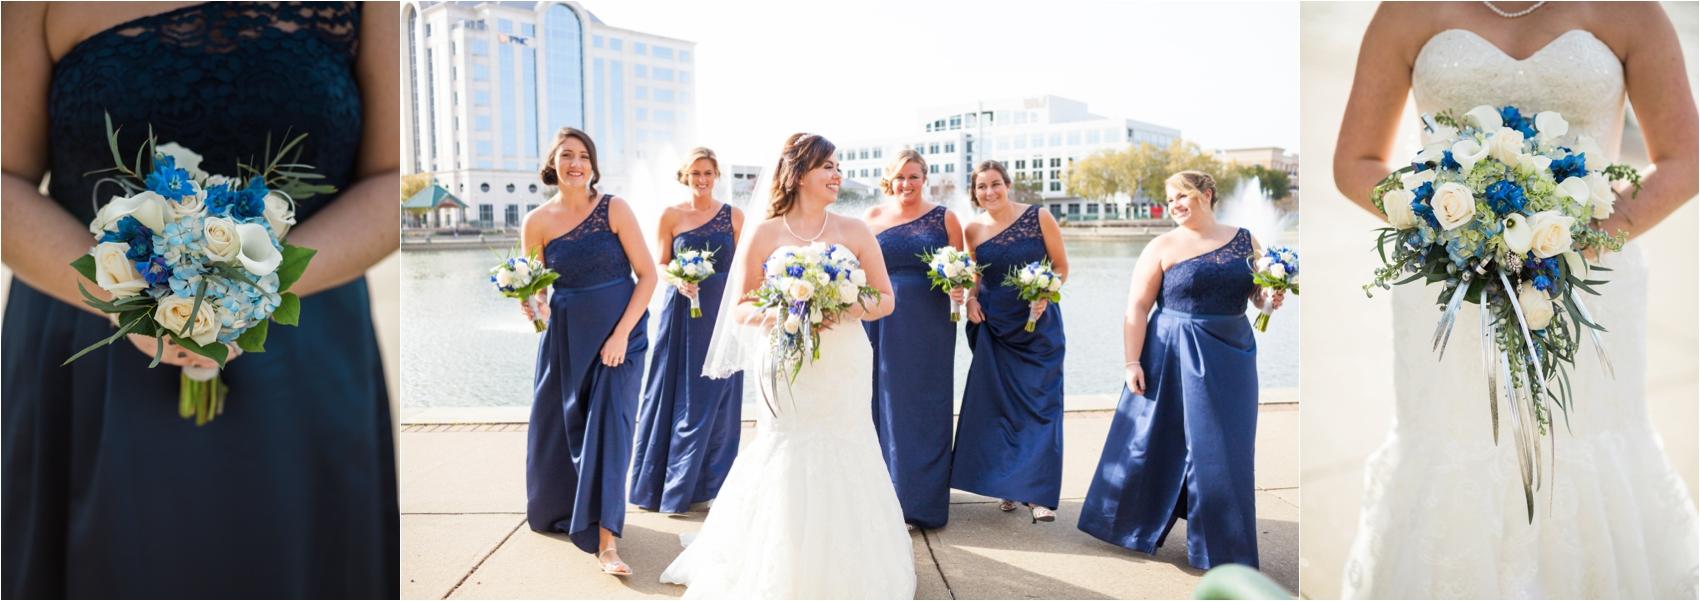 Newport-News-Winter-Wonderland-Wedding_0112.jpg